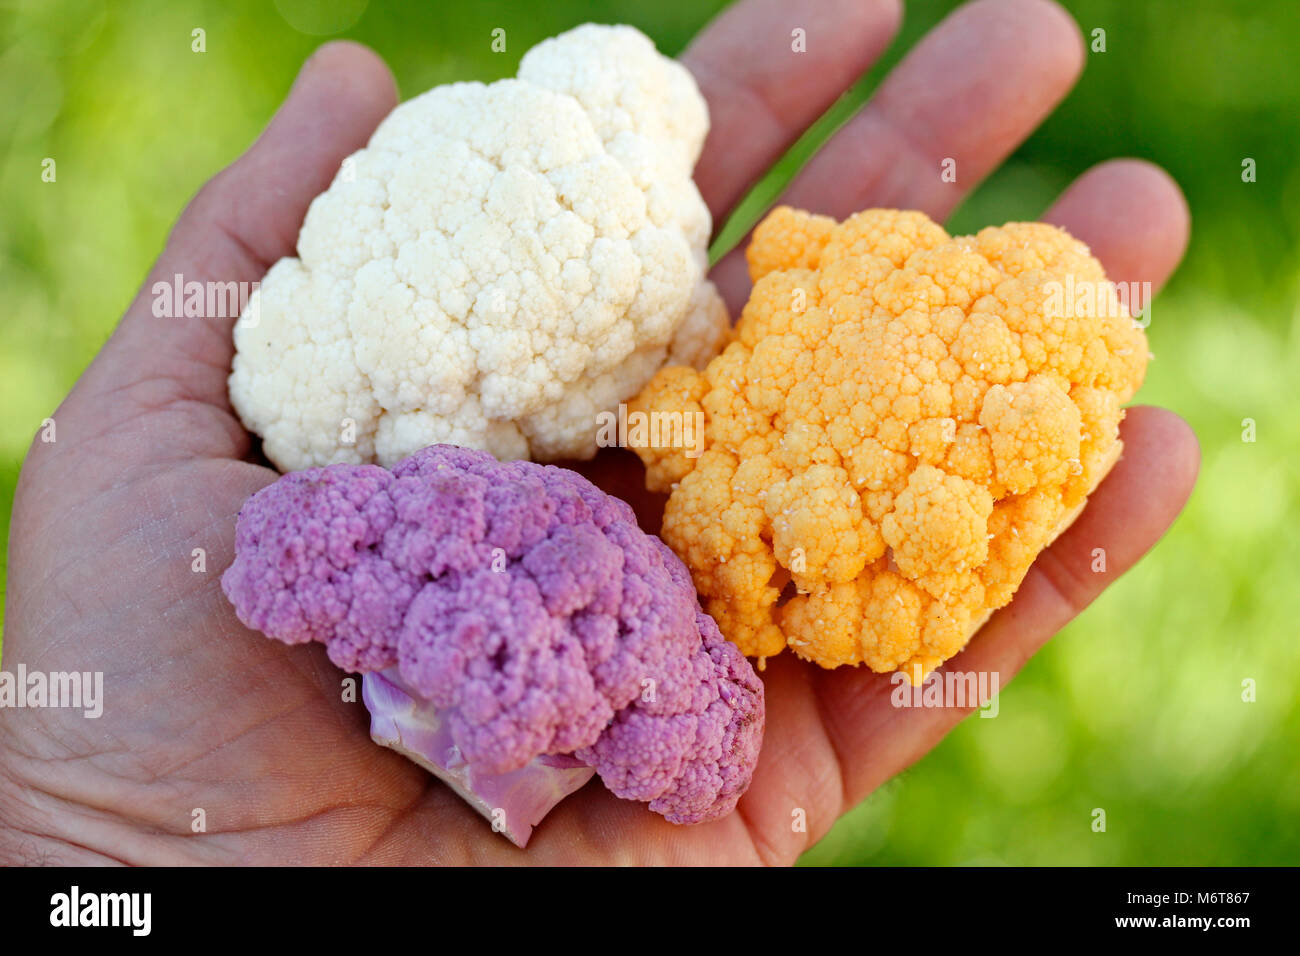 Varied cauliflowers. - Stock Image